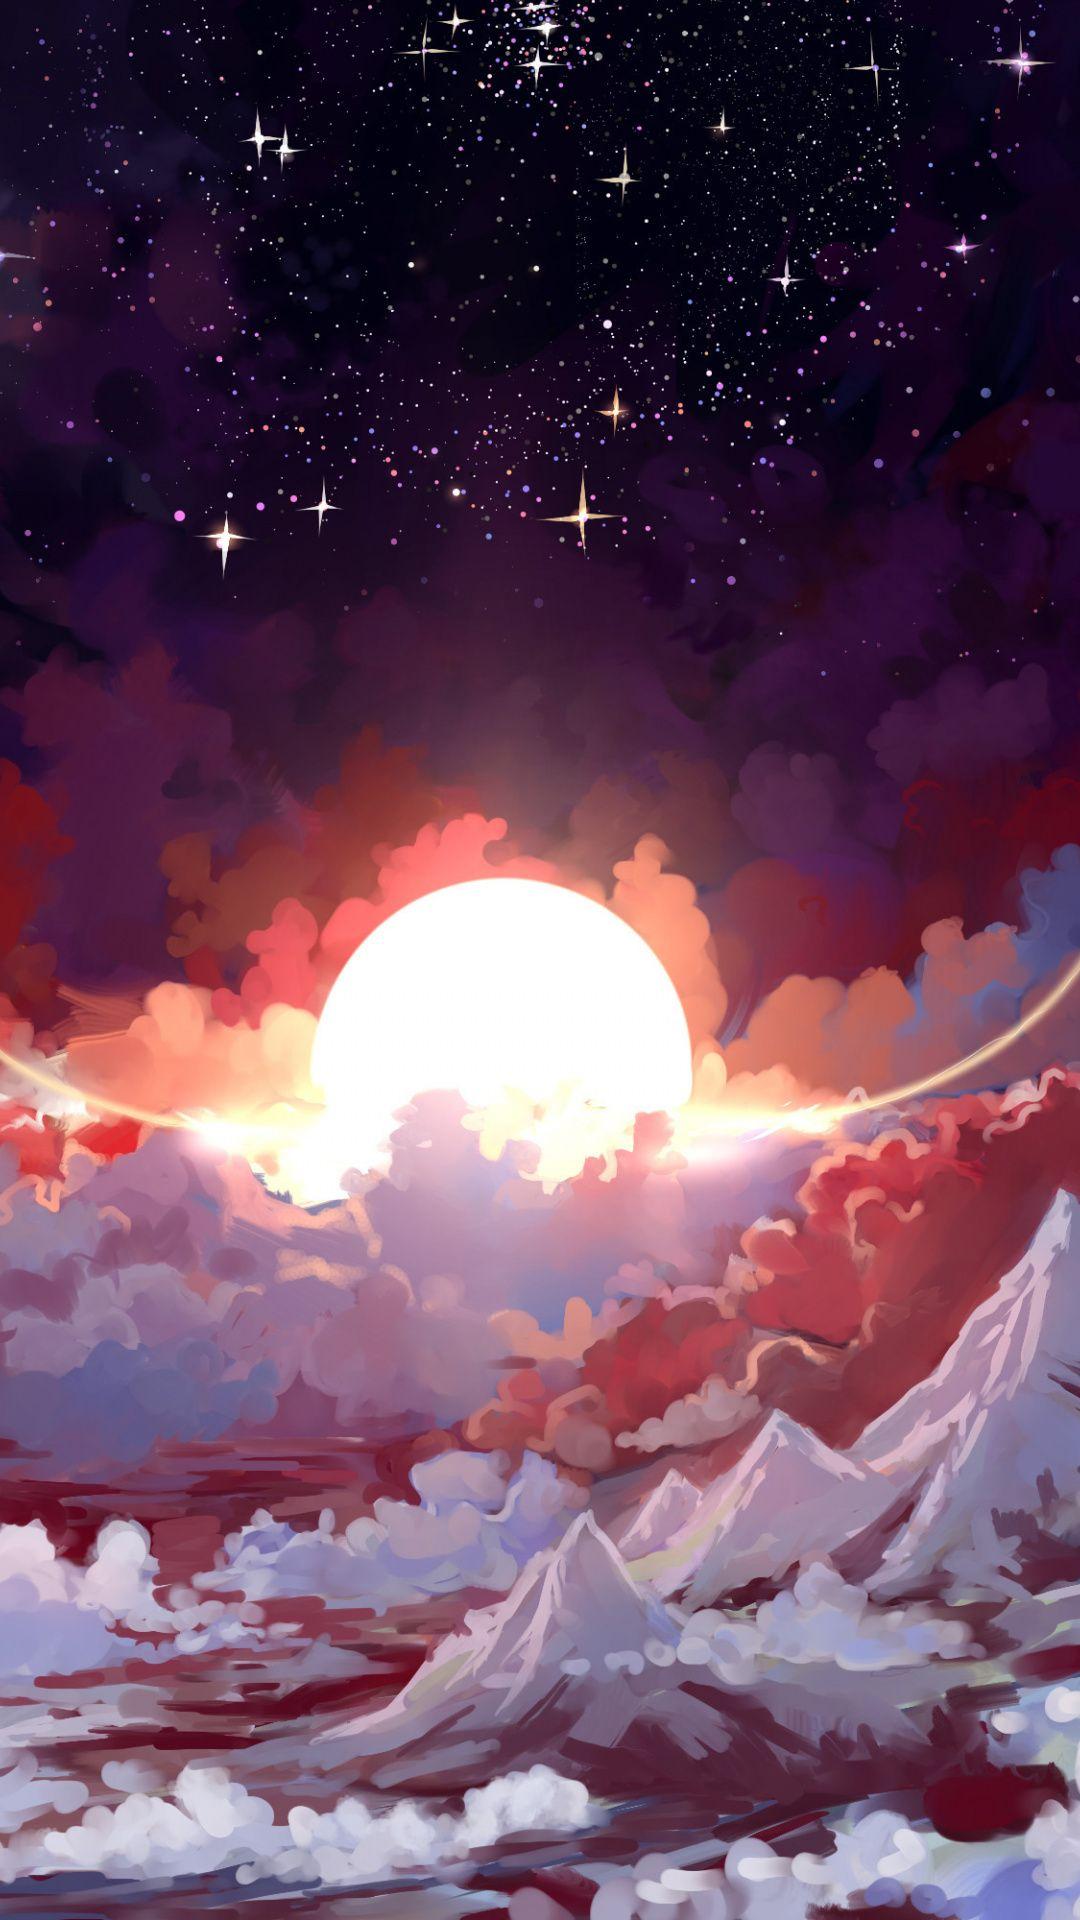 Sun, angels, clouds, fantasy, art, 1080x1920 wallpaper